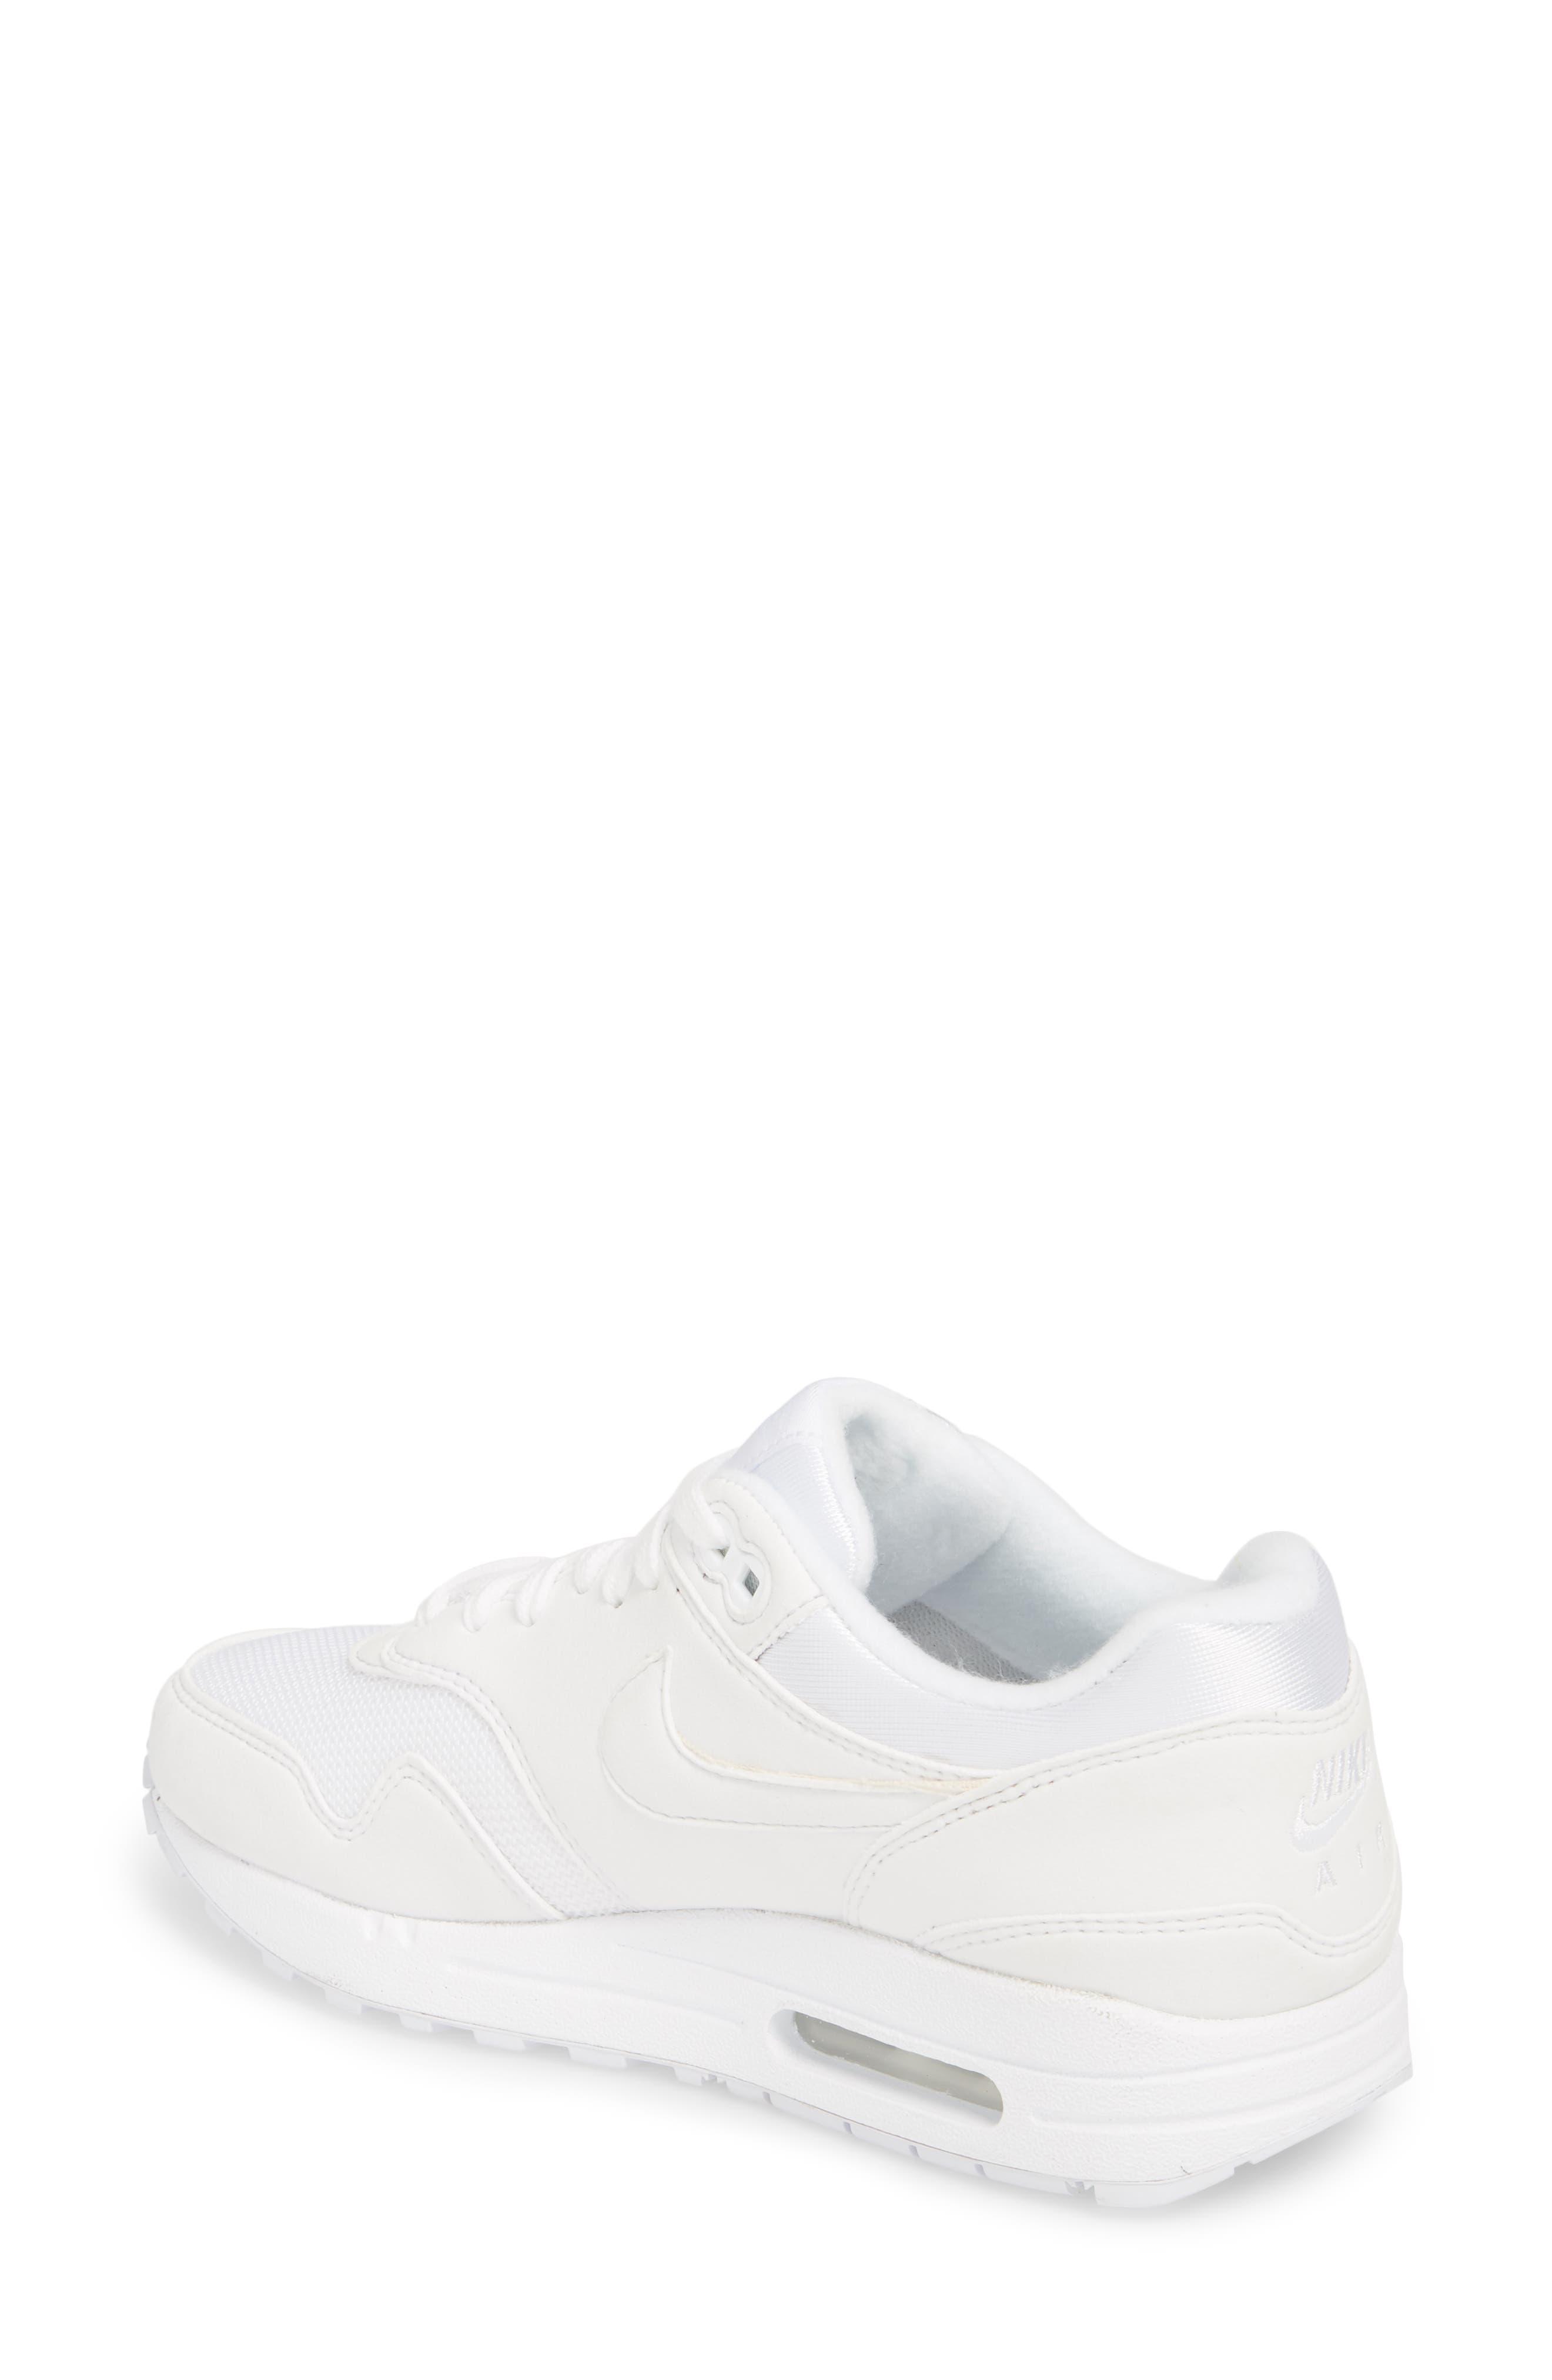 'Air Max 1 ND' Sneaker,                             Alternate thumbnail 2, color,                             WHITE/ WHITE/ PURE PLATINUM